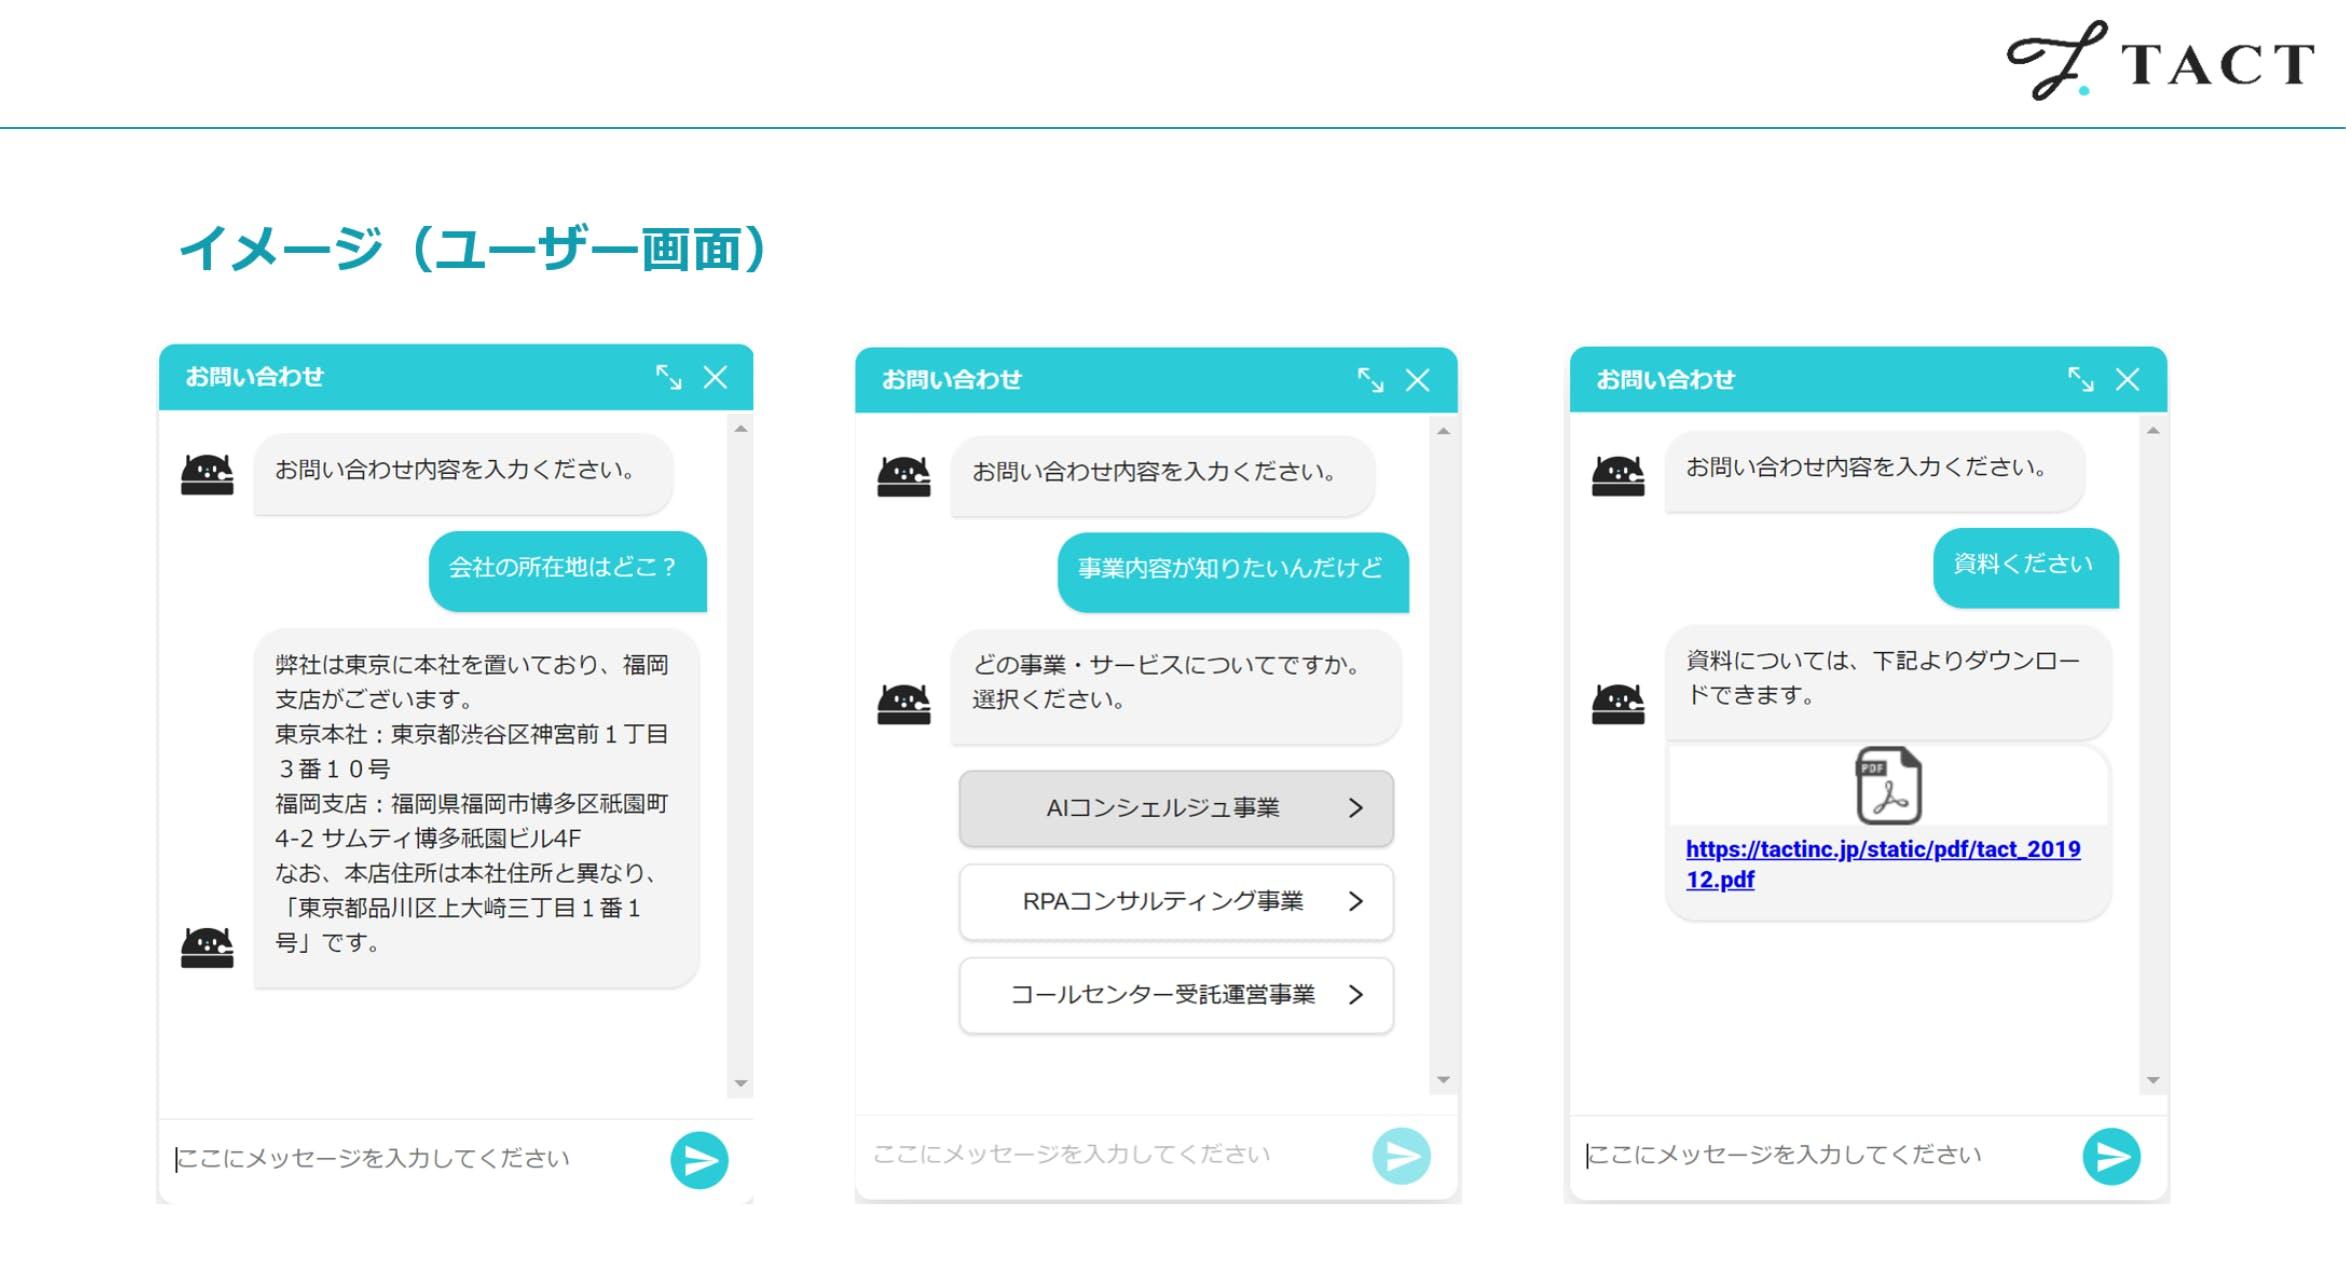 AIコンシェルジュ® for チャットボット ユーザー画面